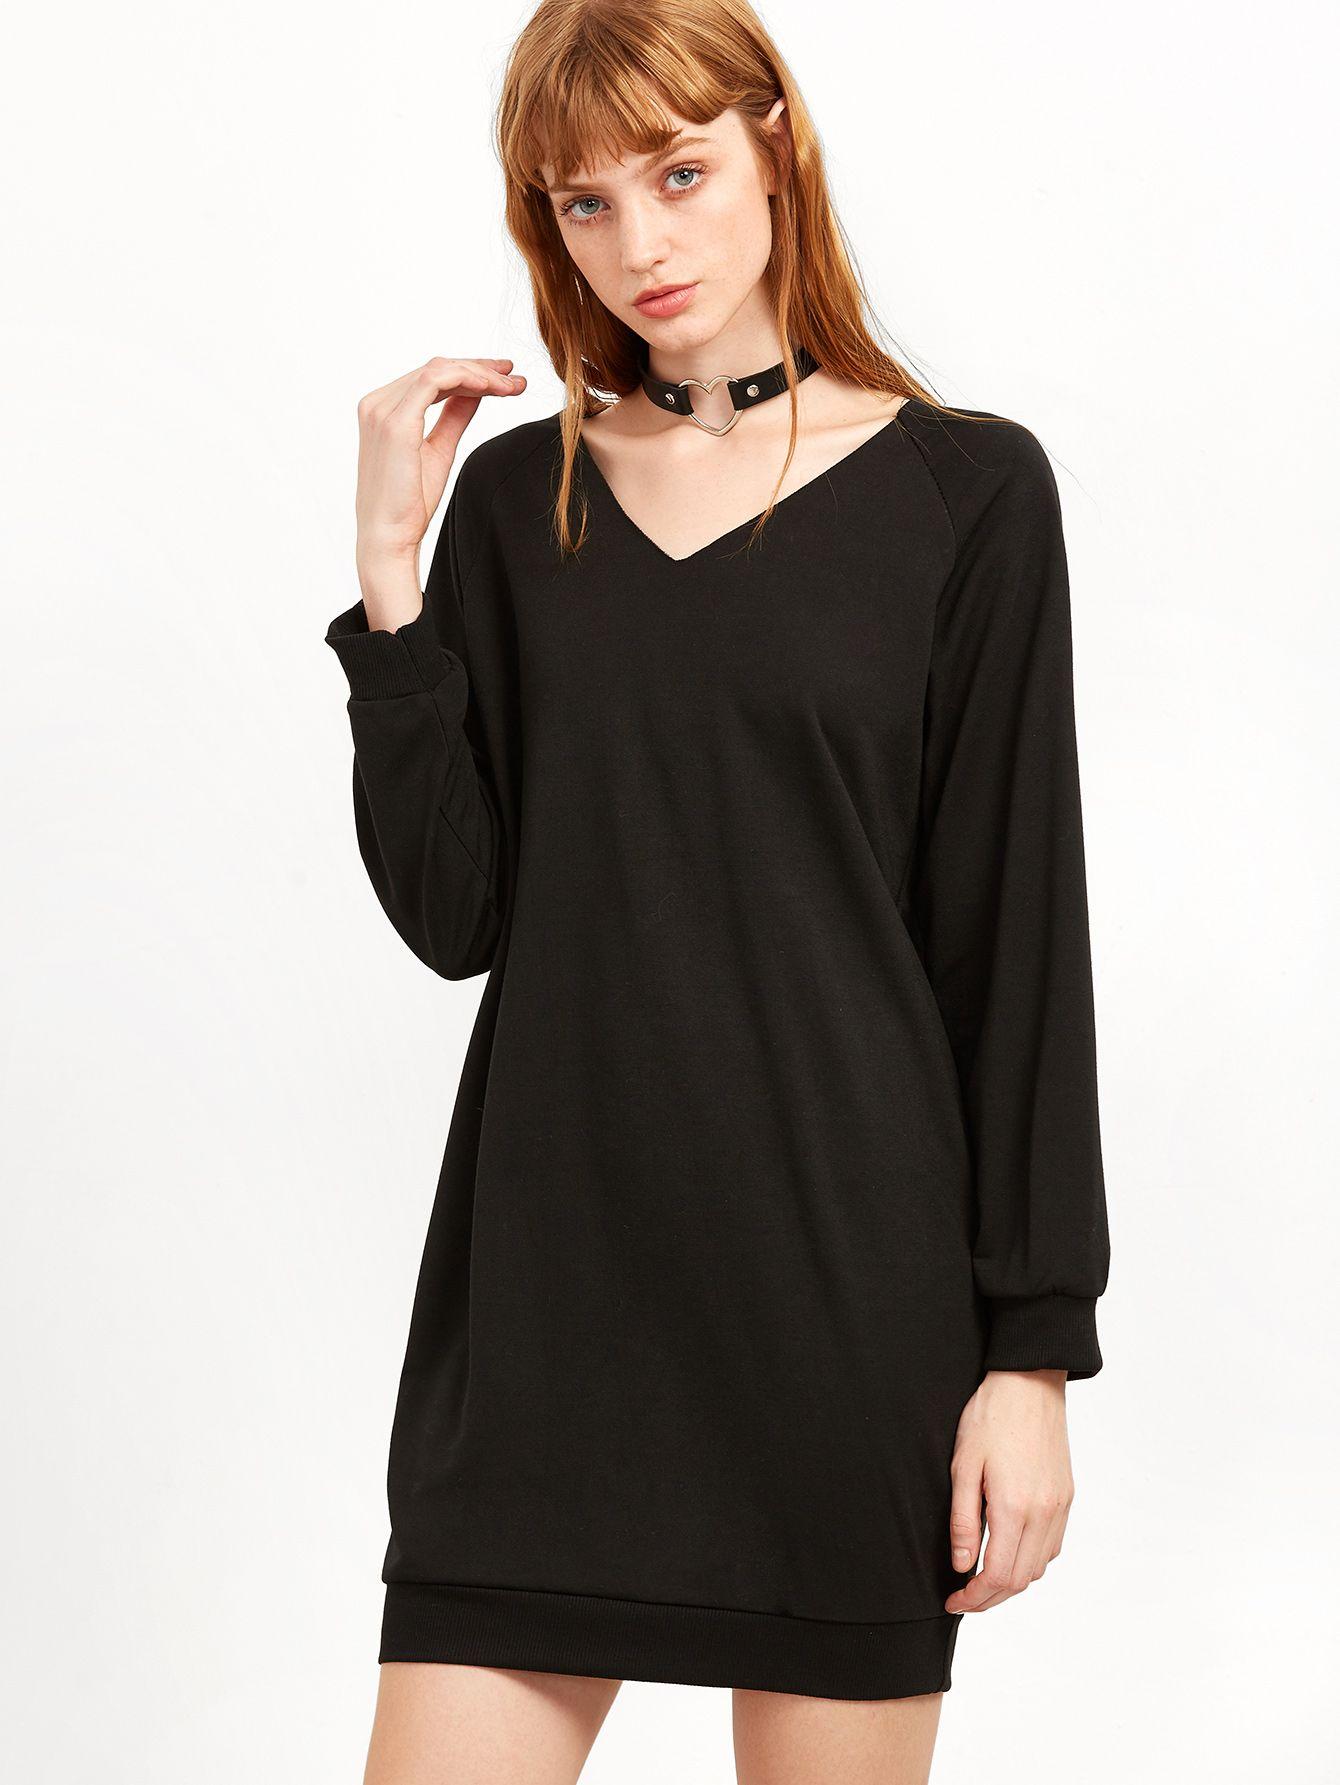 Adorewe shein dresses shein black v neck sweatshirt dress